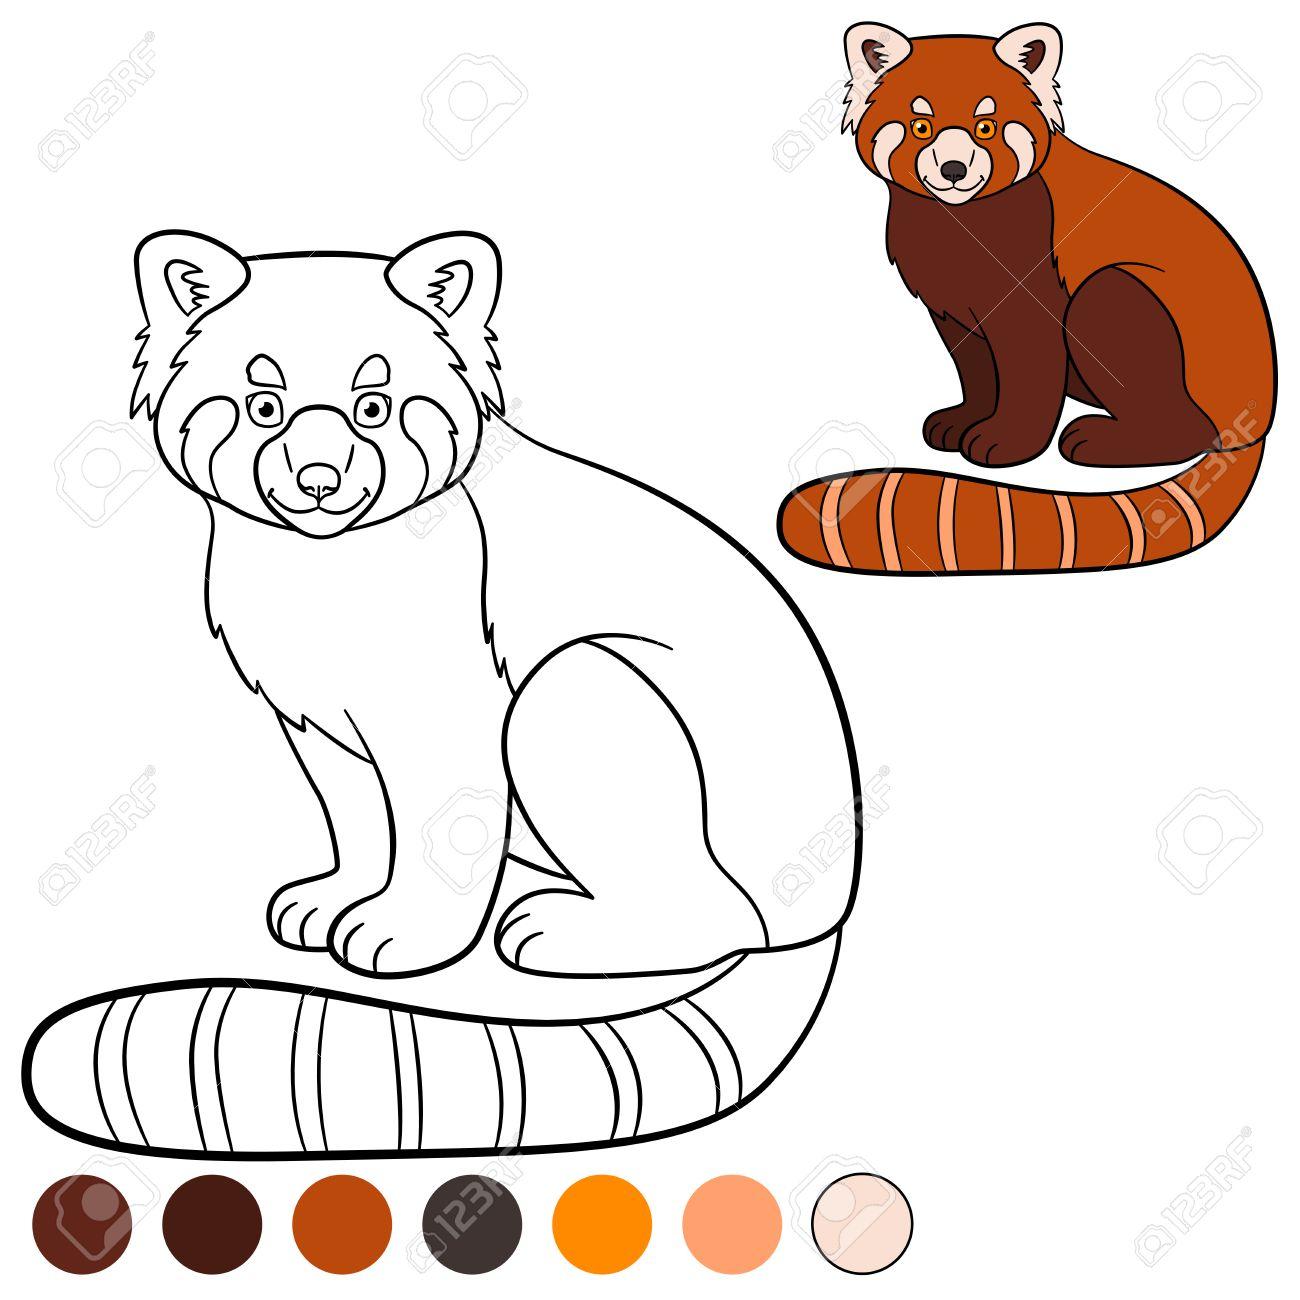 Image Panda Roux Dessin